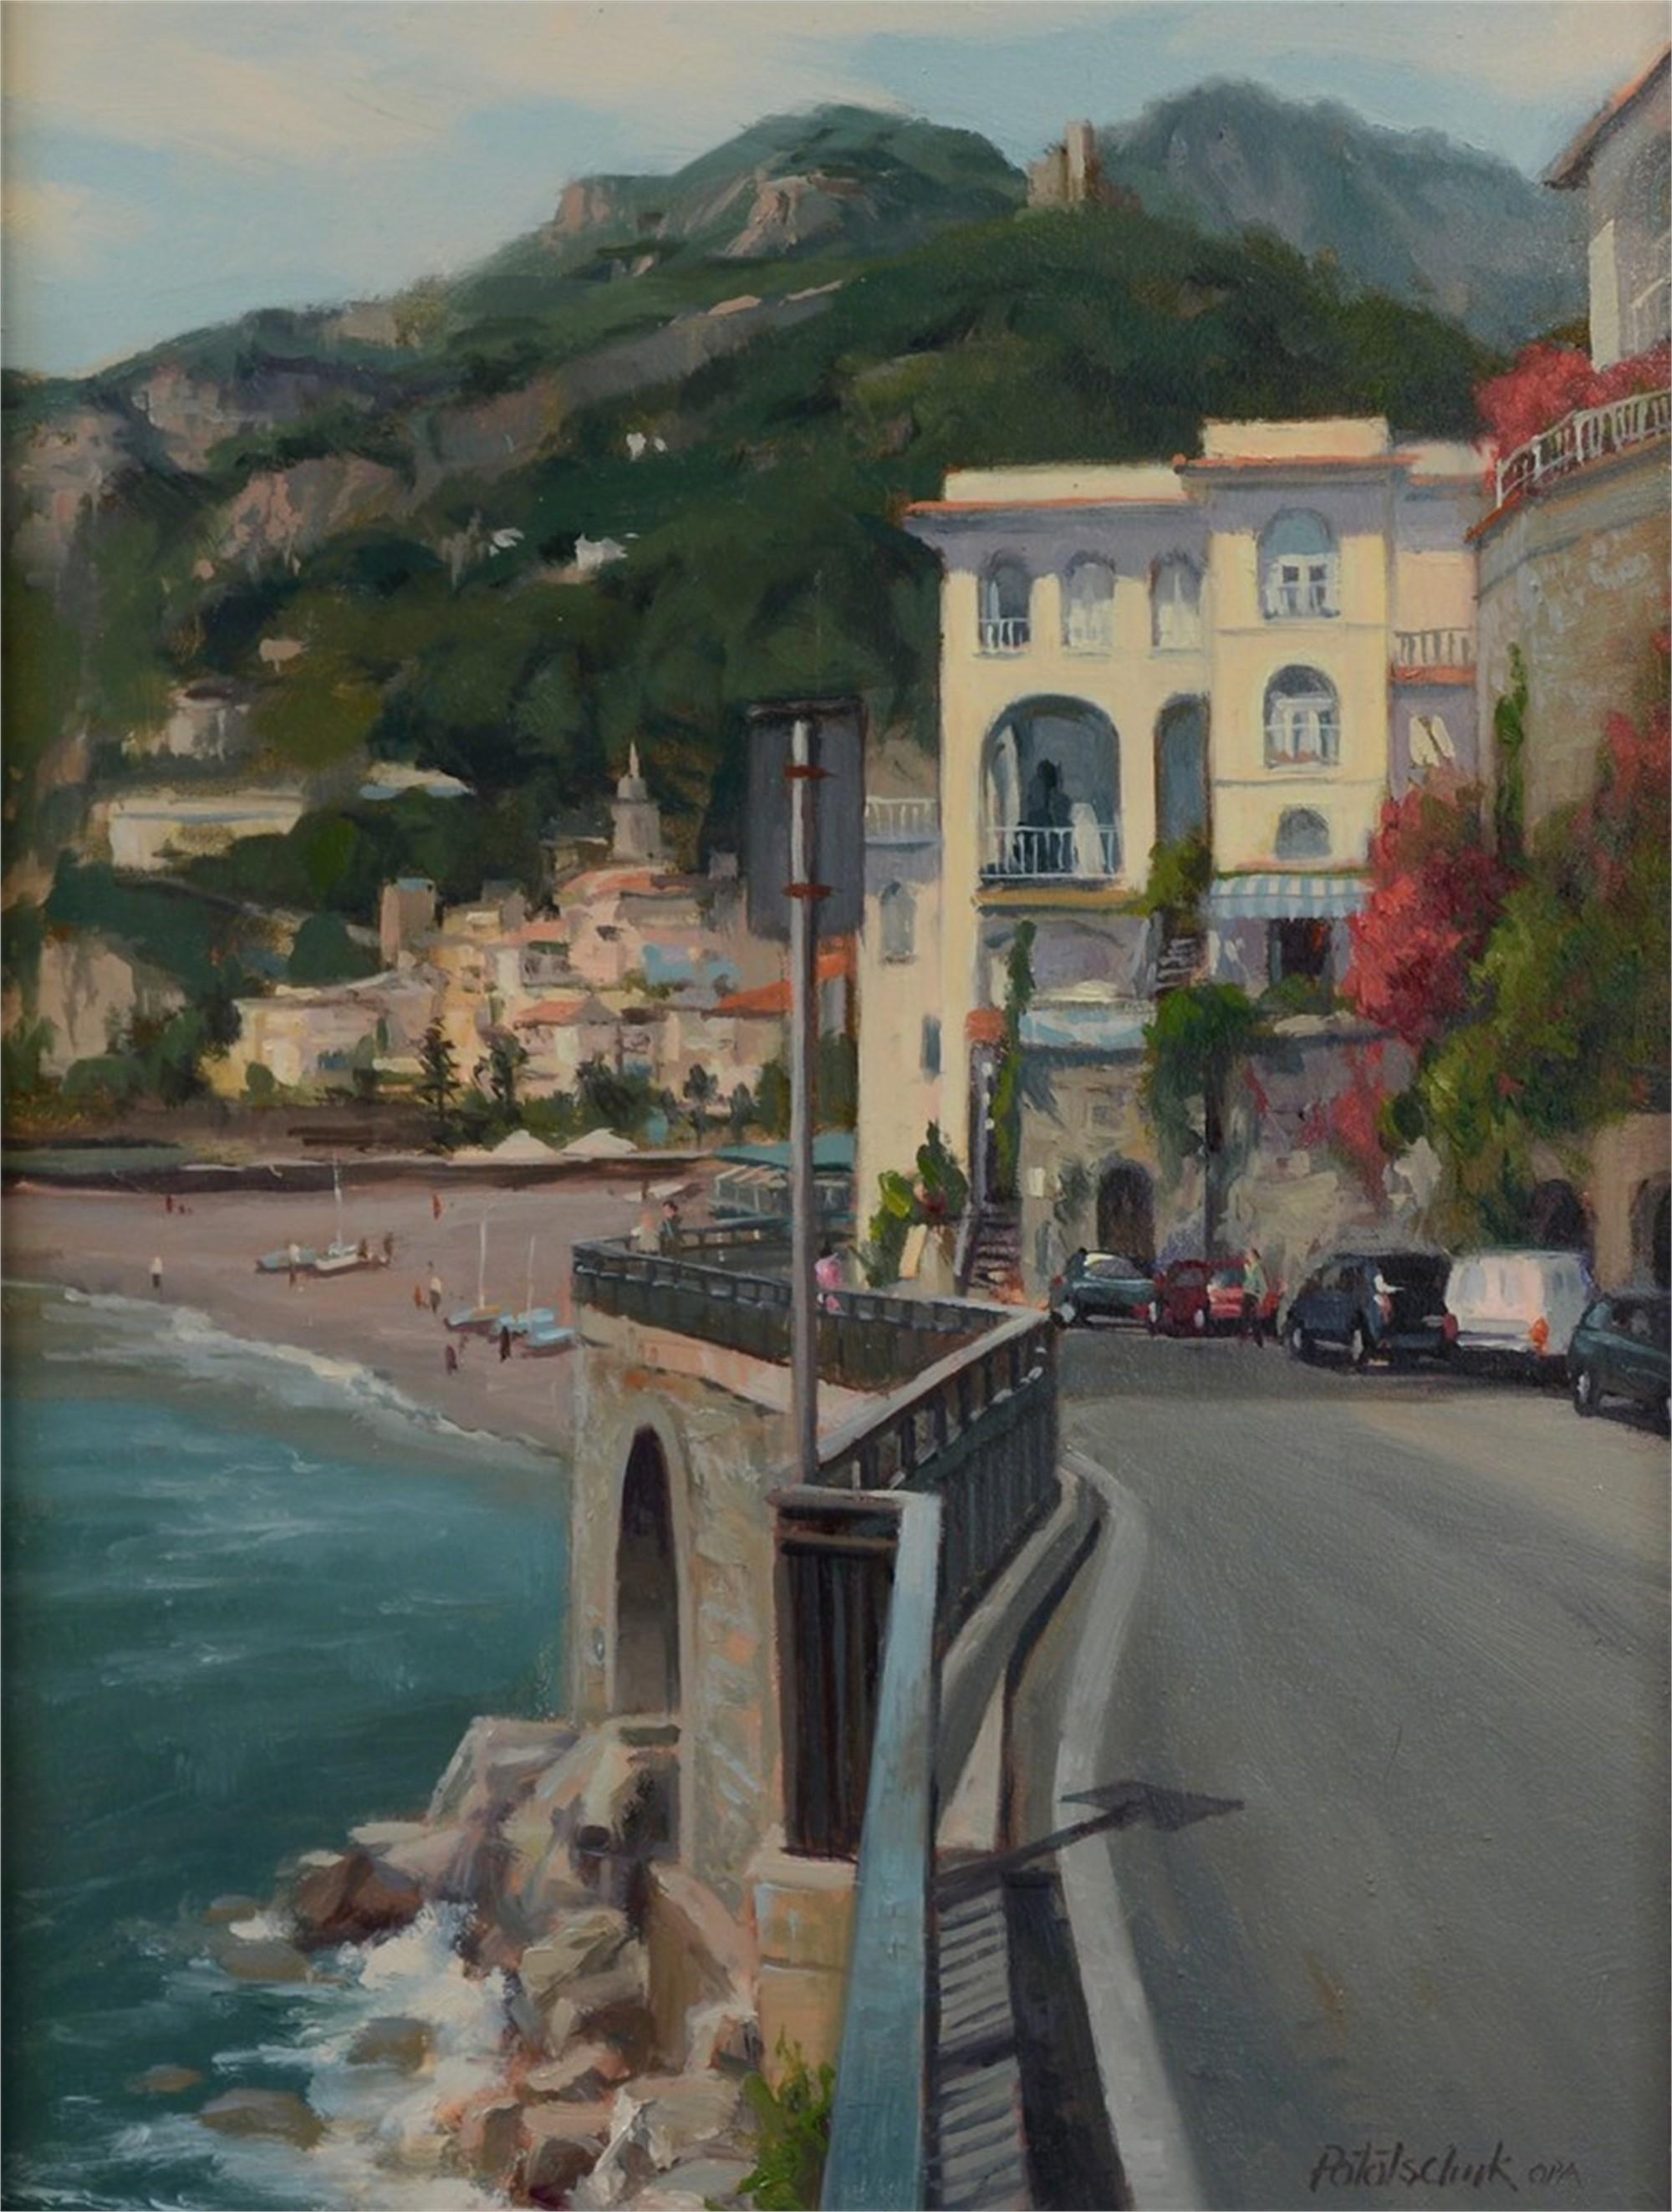 Amalfi by John Pototschnik